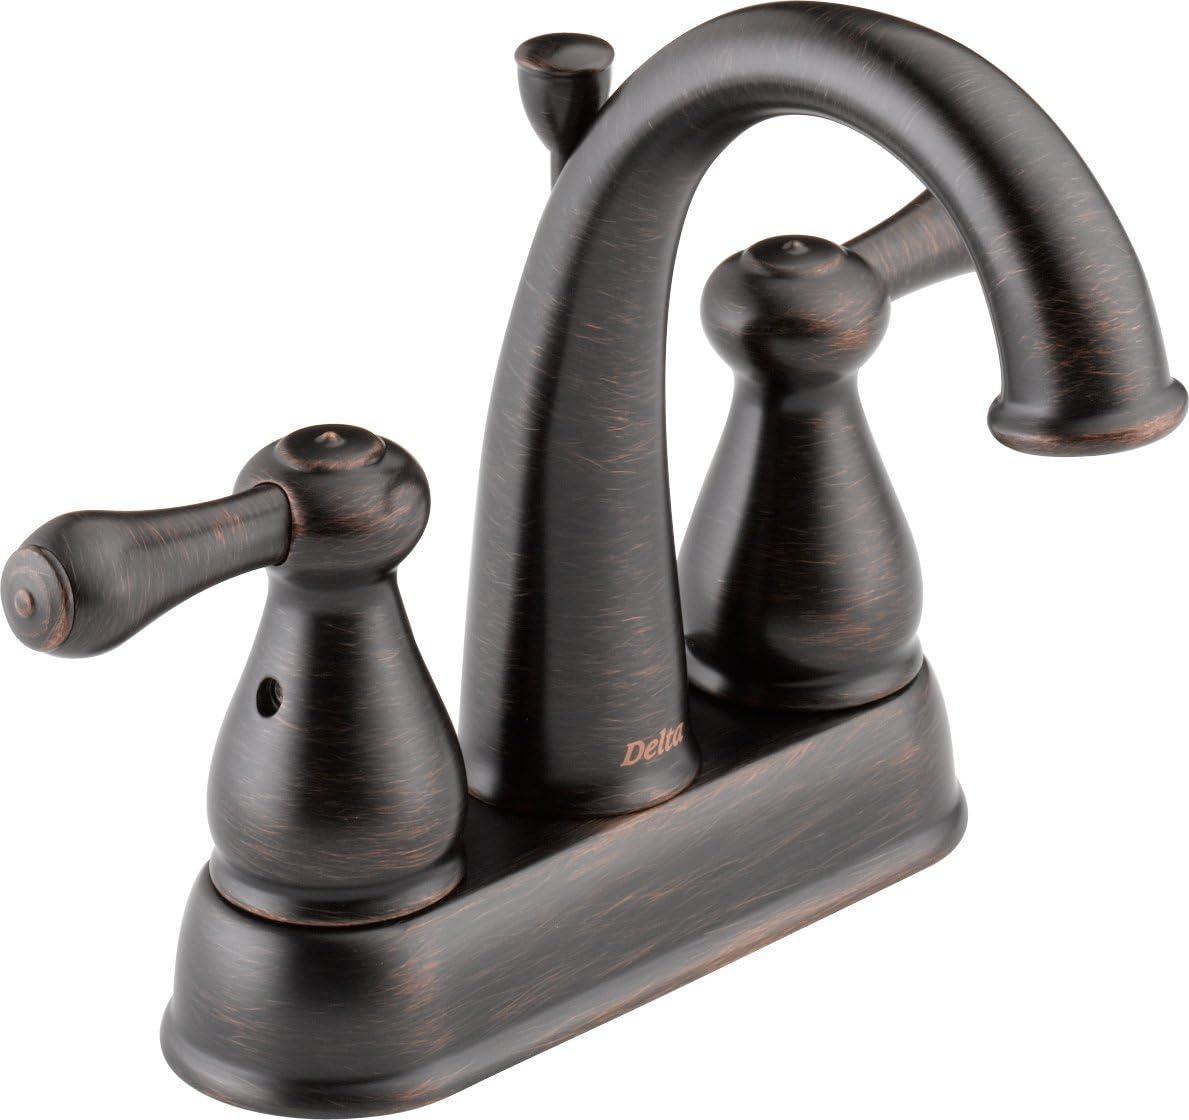 Delta Faucet 2575LF-RBMPU Leland, Two Handle Centerset Bathroom Faucet, Venetian Bronze